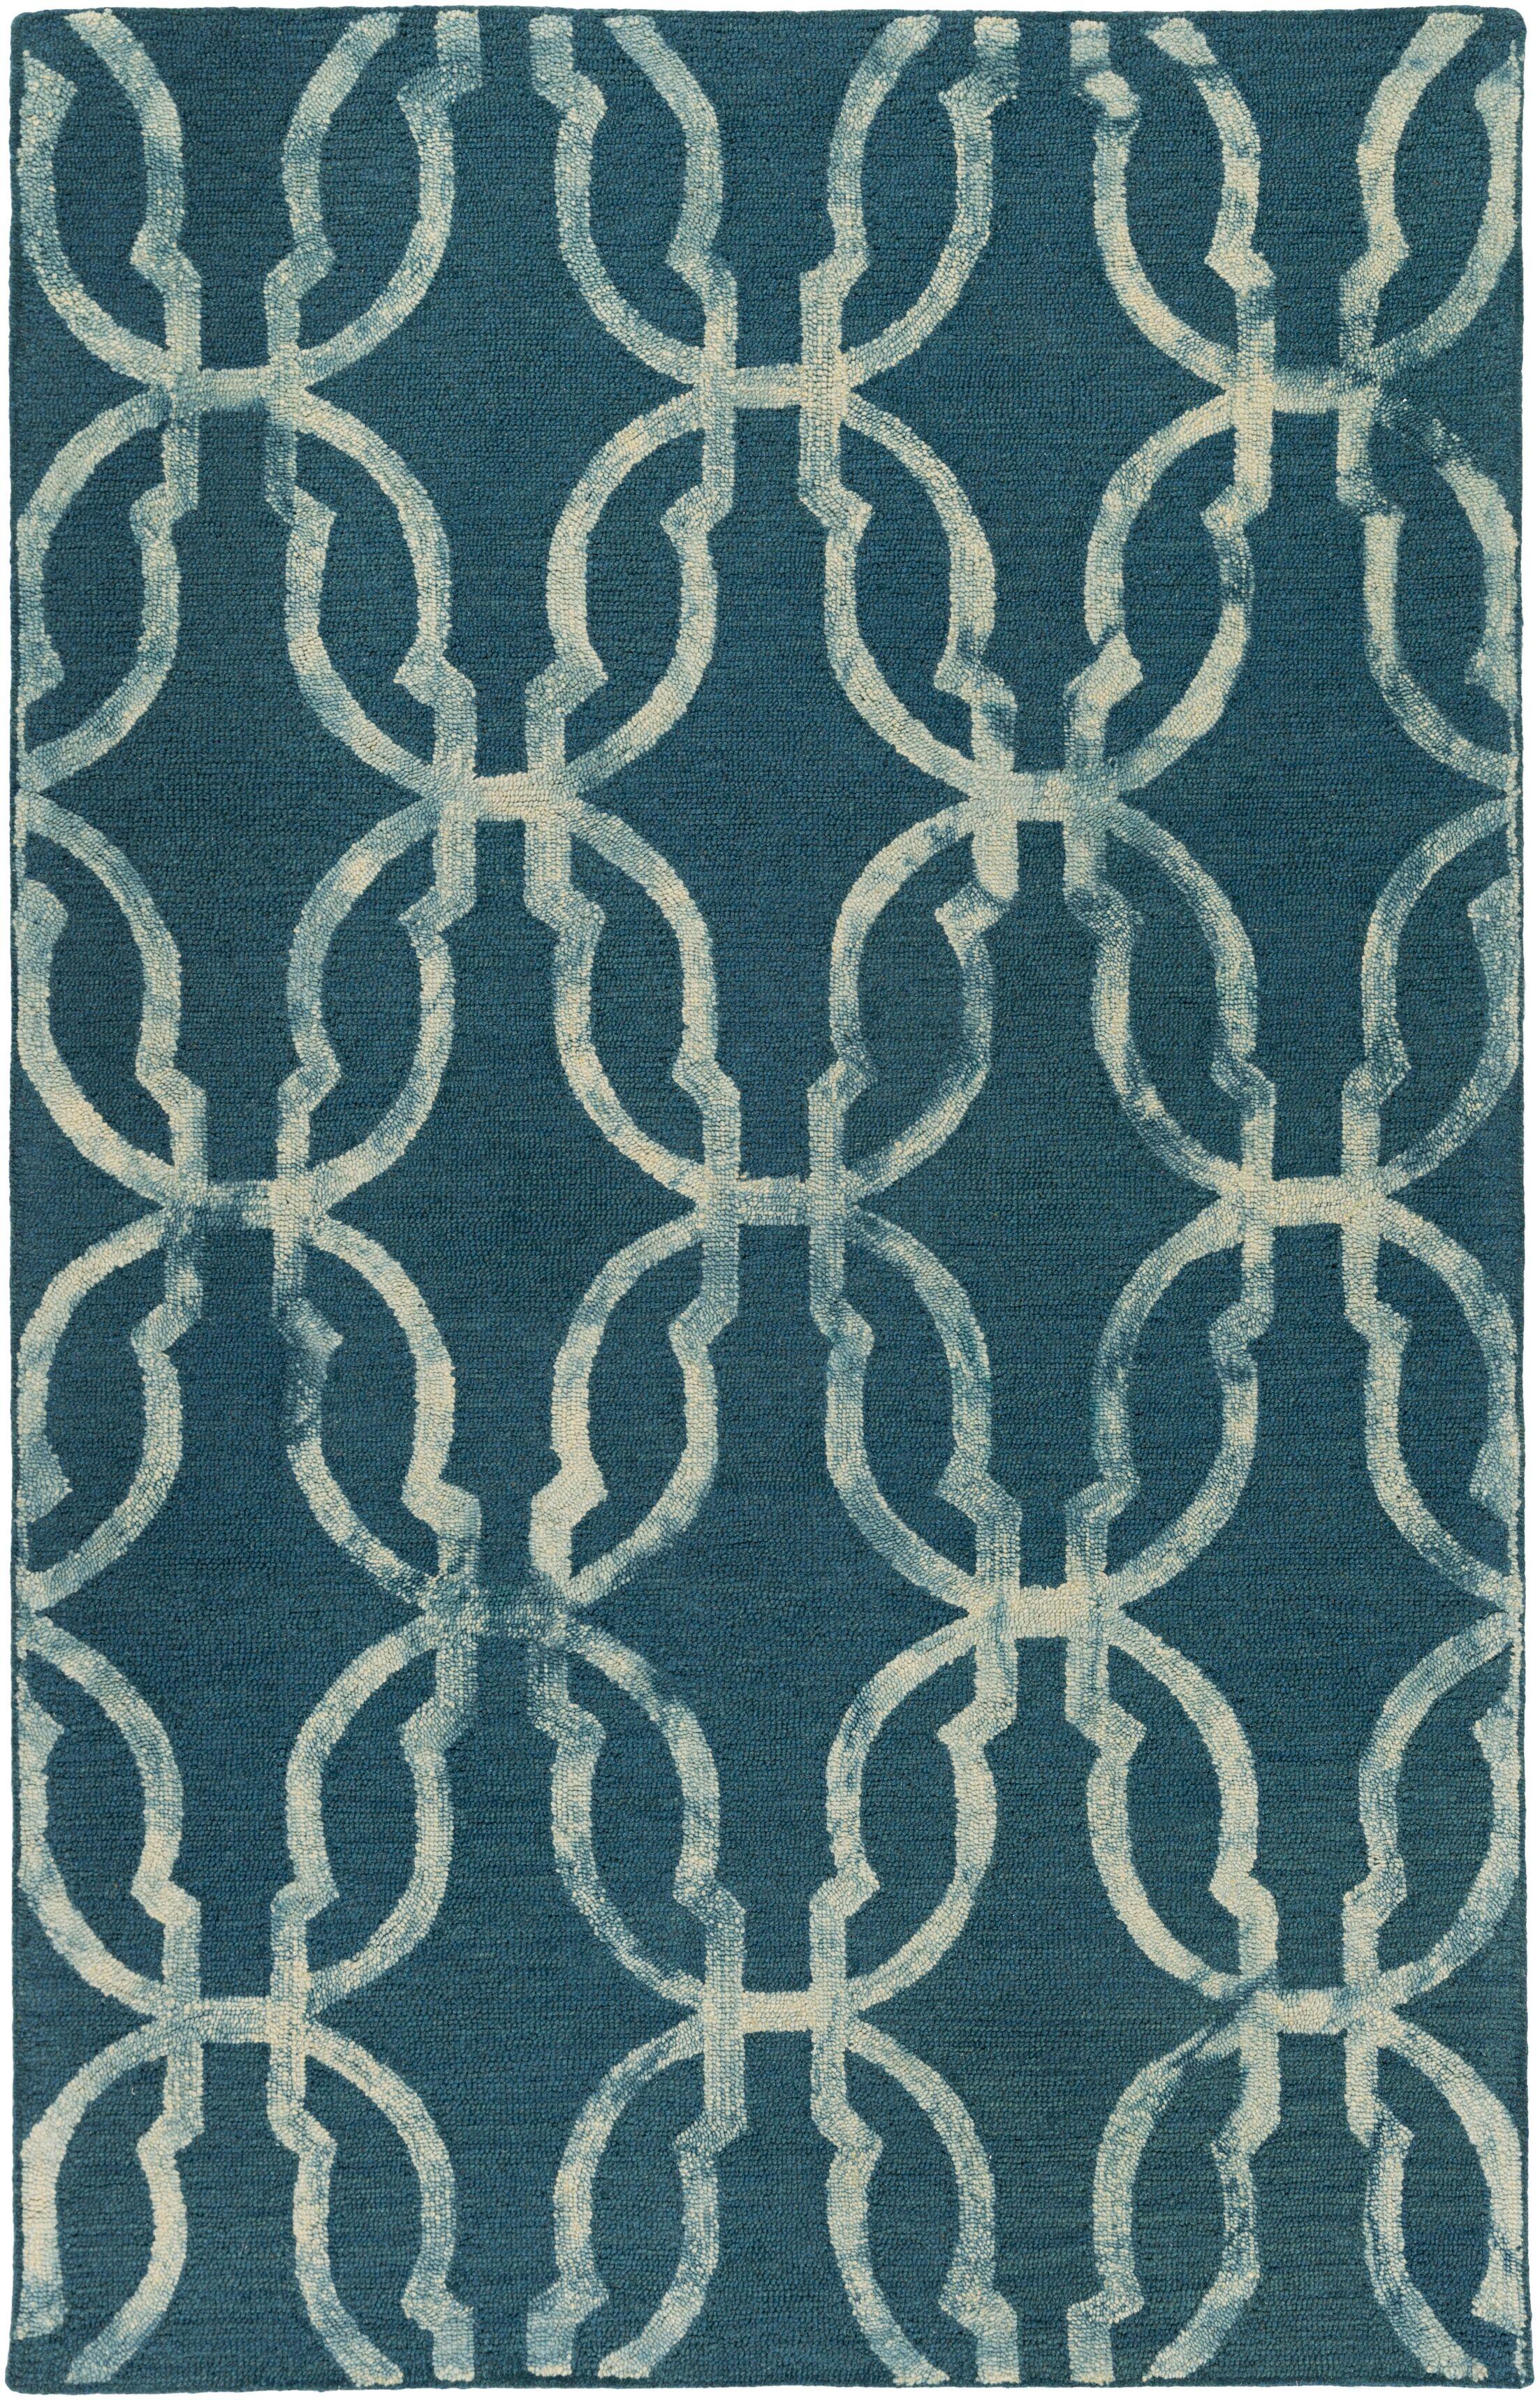 Glennon Hand-Tufted Teal/Beige Area Rug Rug Size: Rectangle 9' x 13'